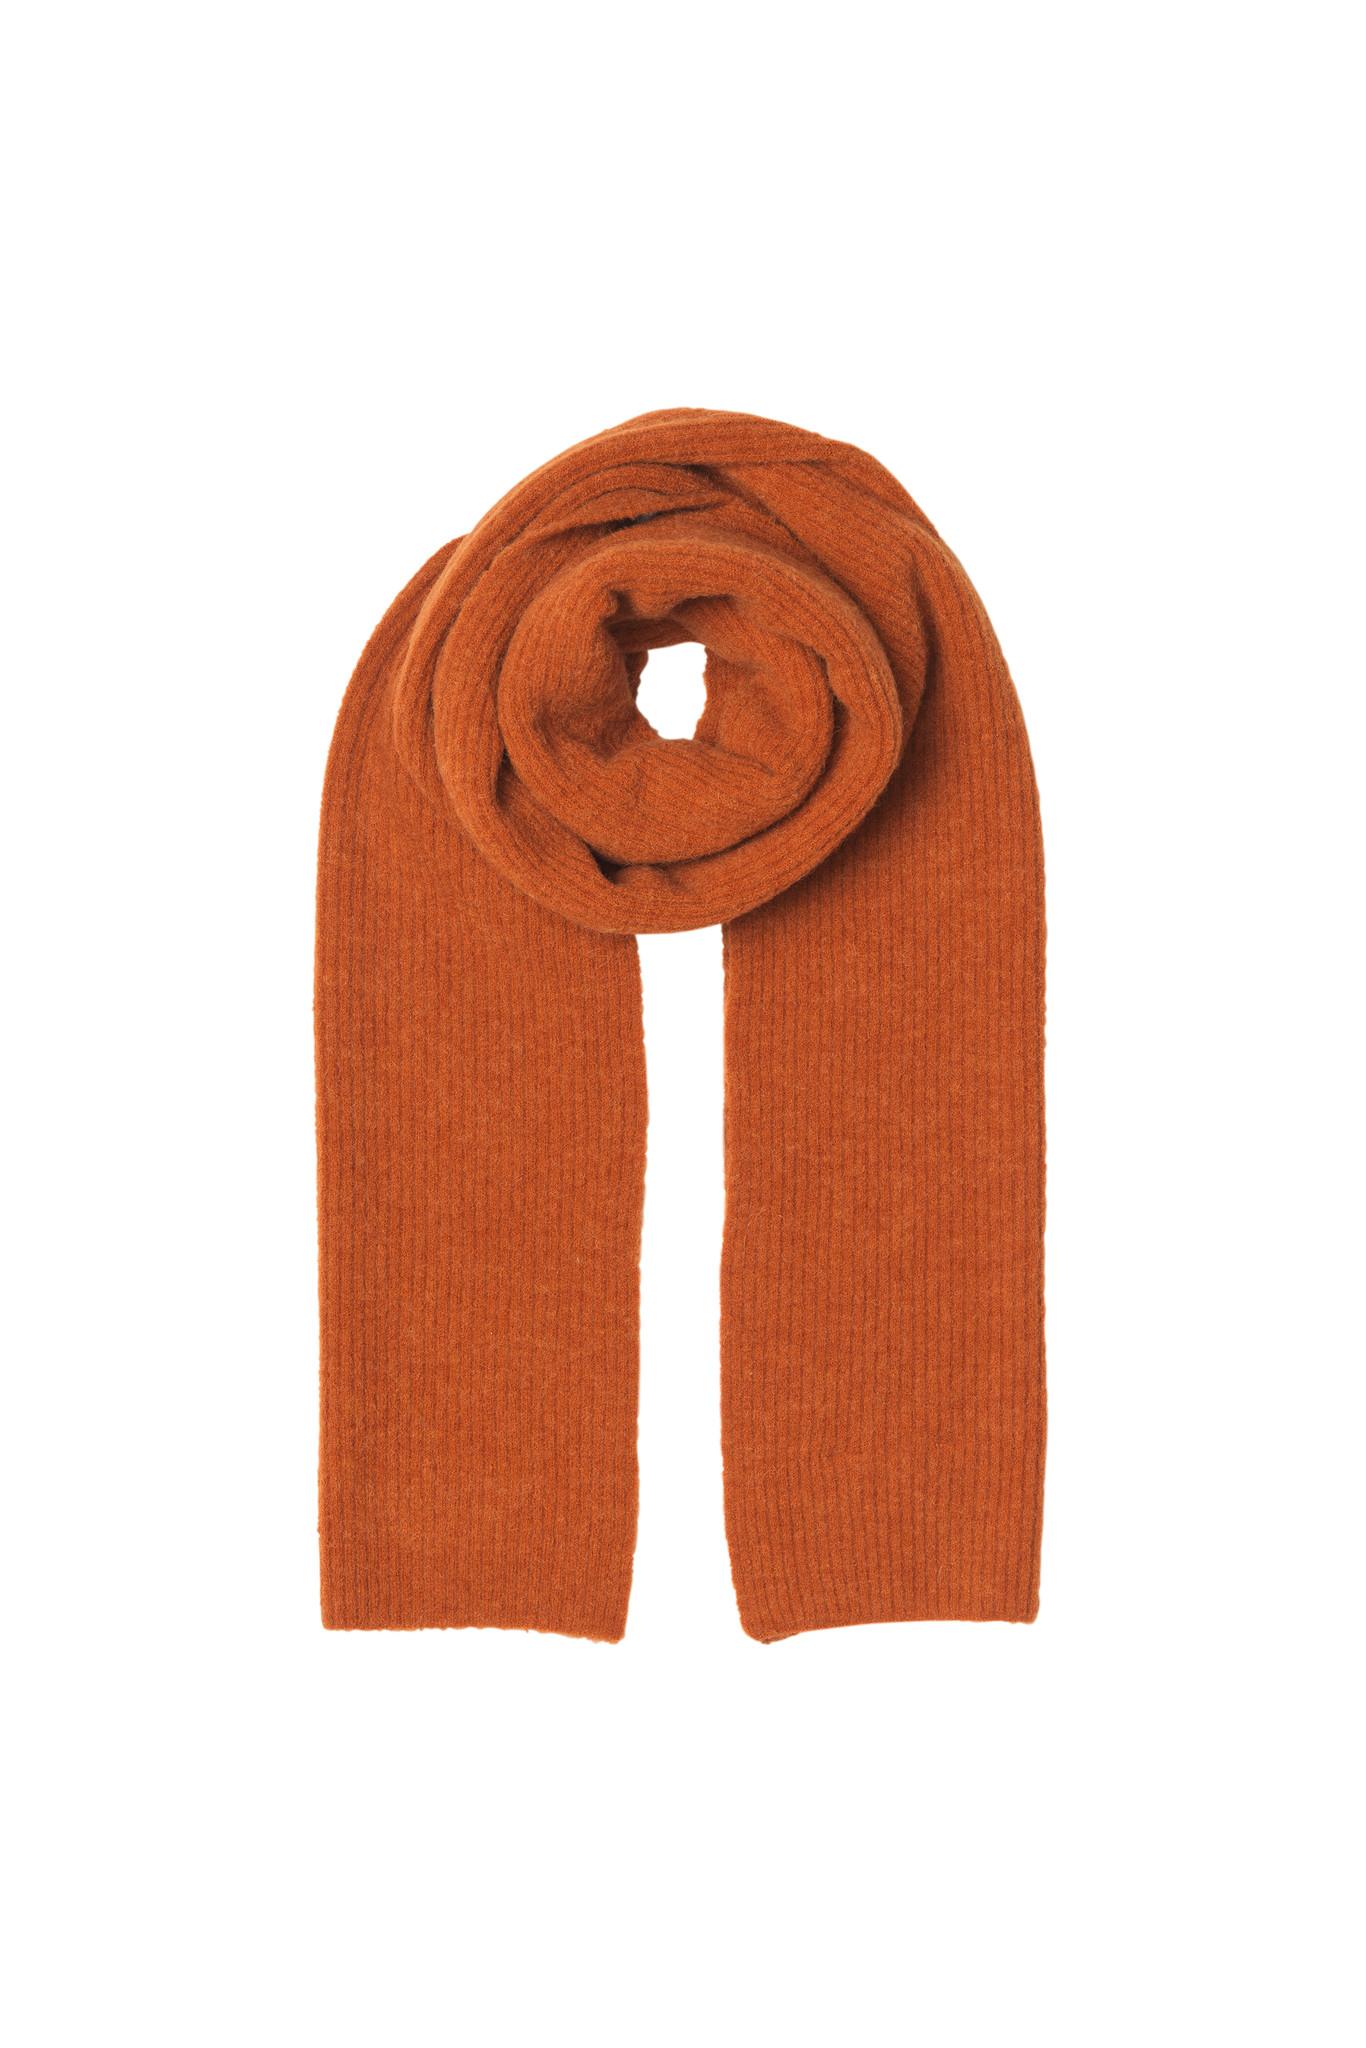 Rhonda Sjaal - Gebrand Oranje-1